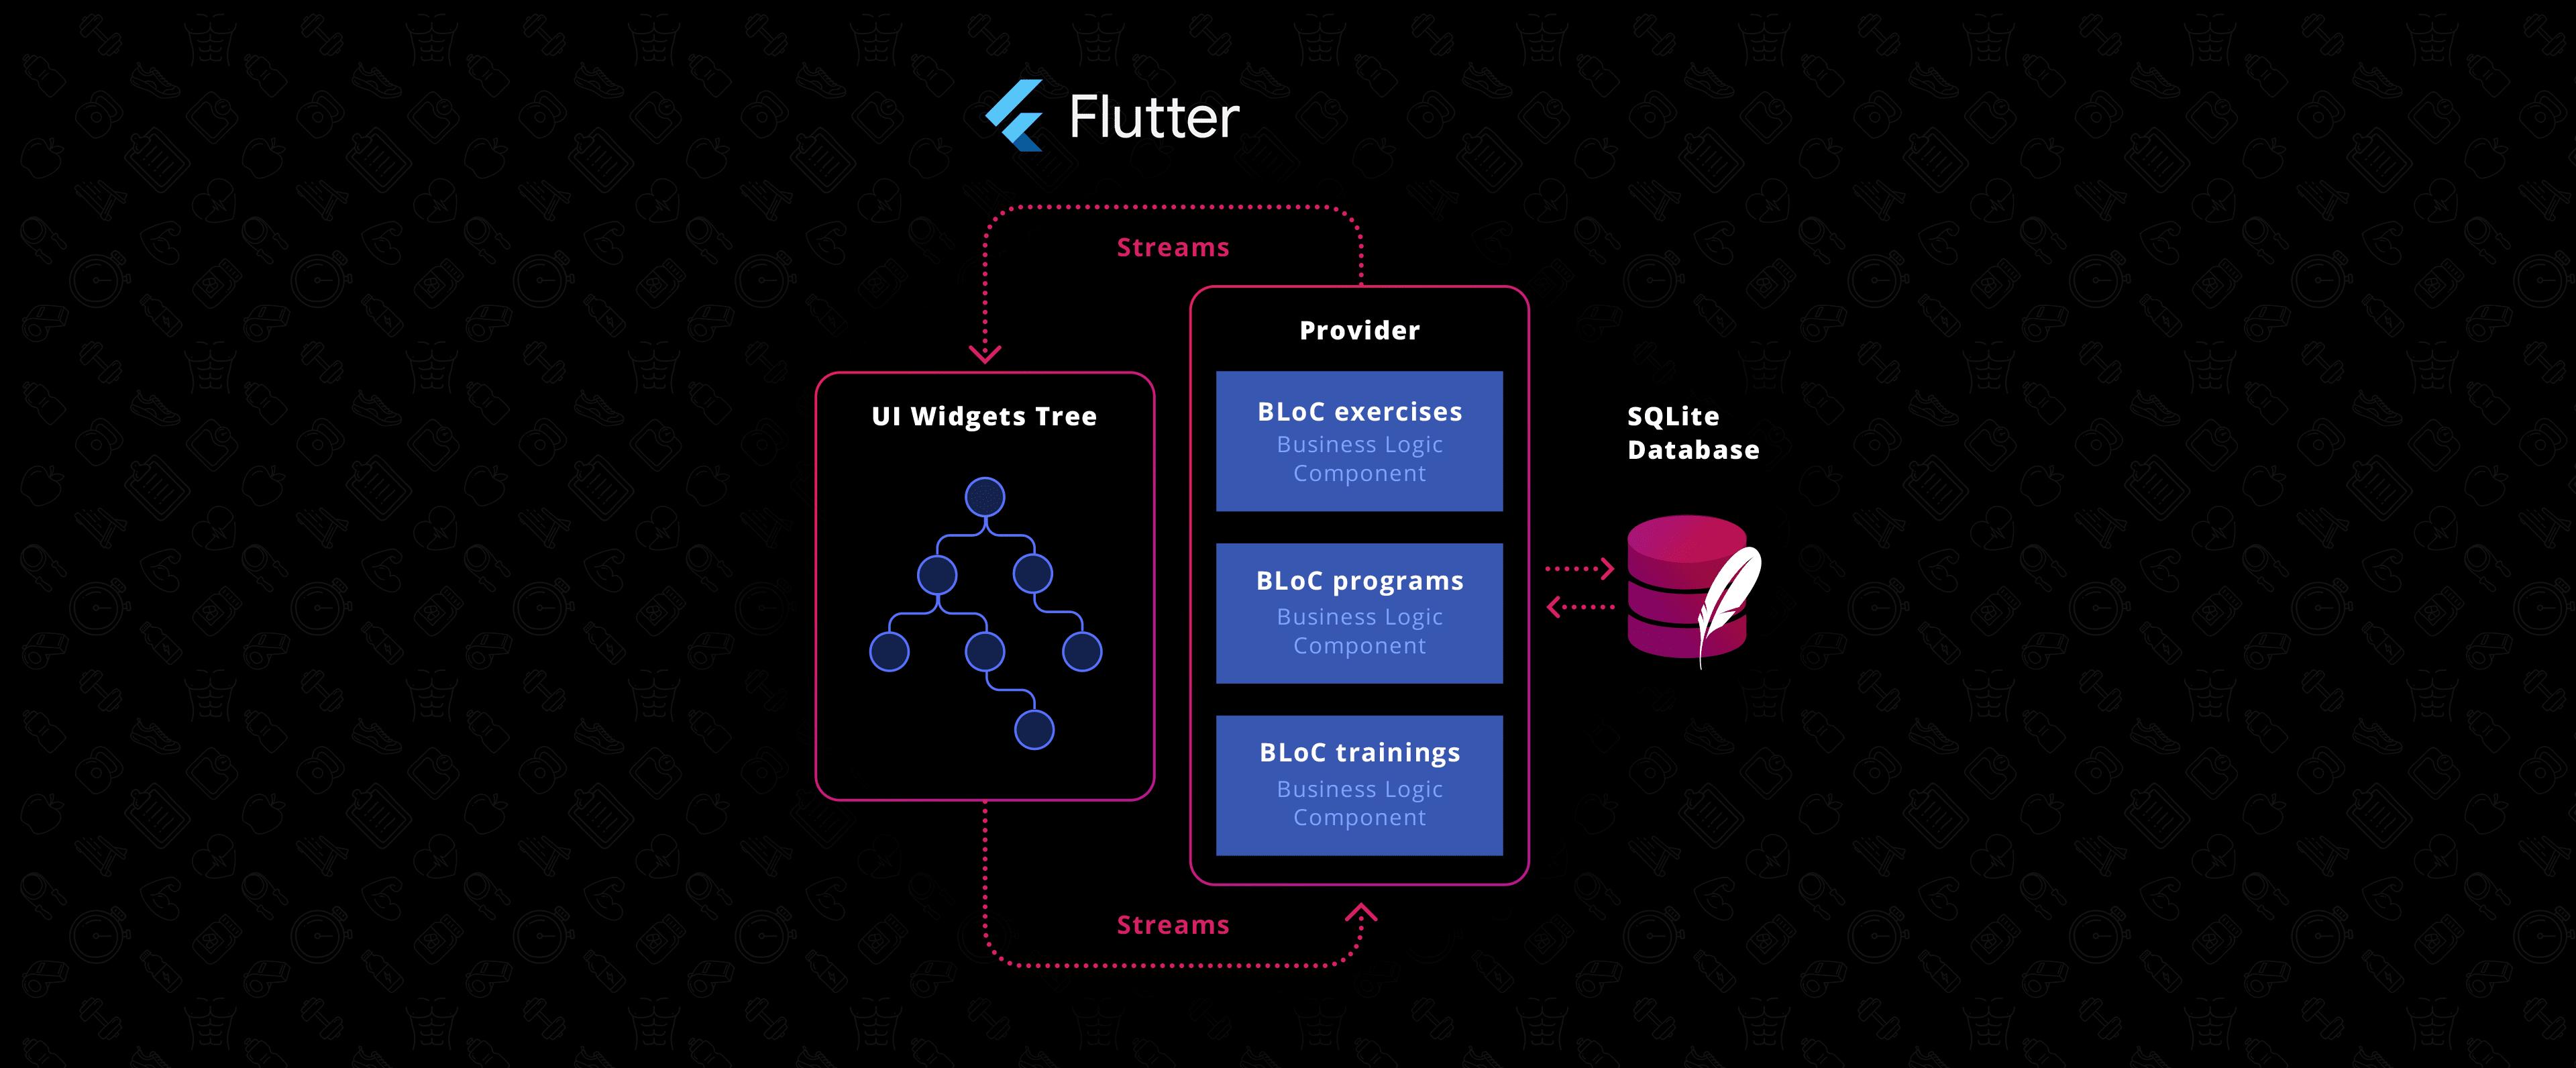 Flutter allows for 1 second compilation